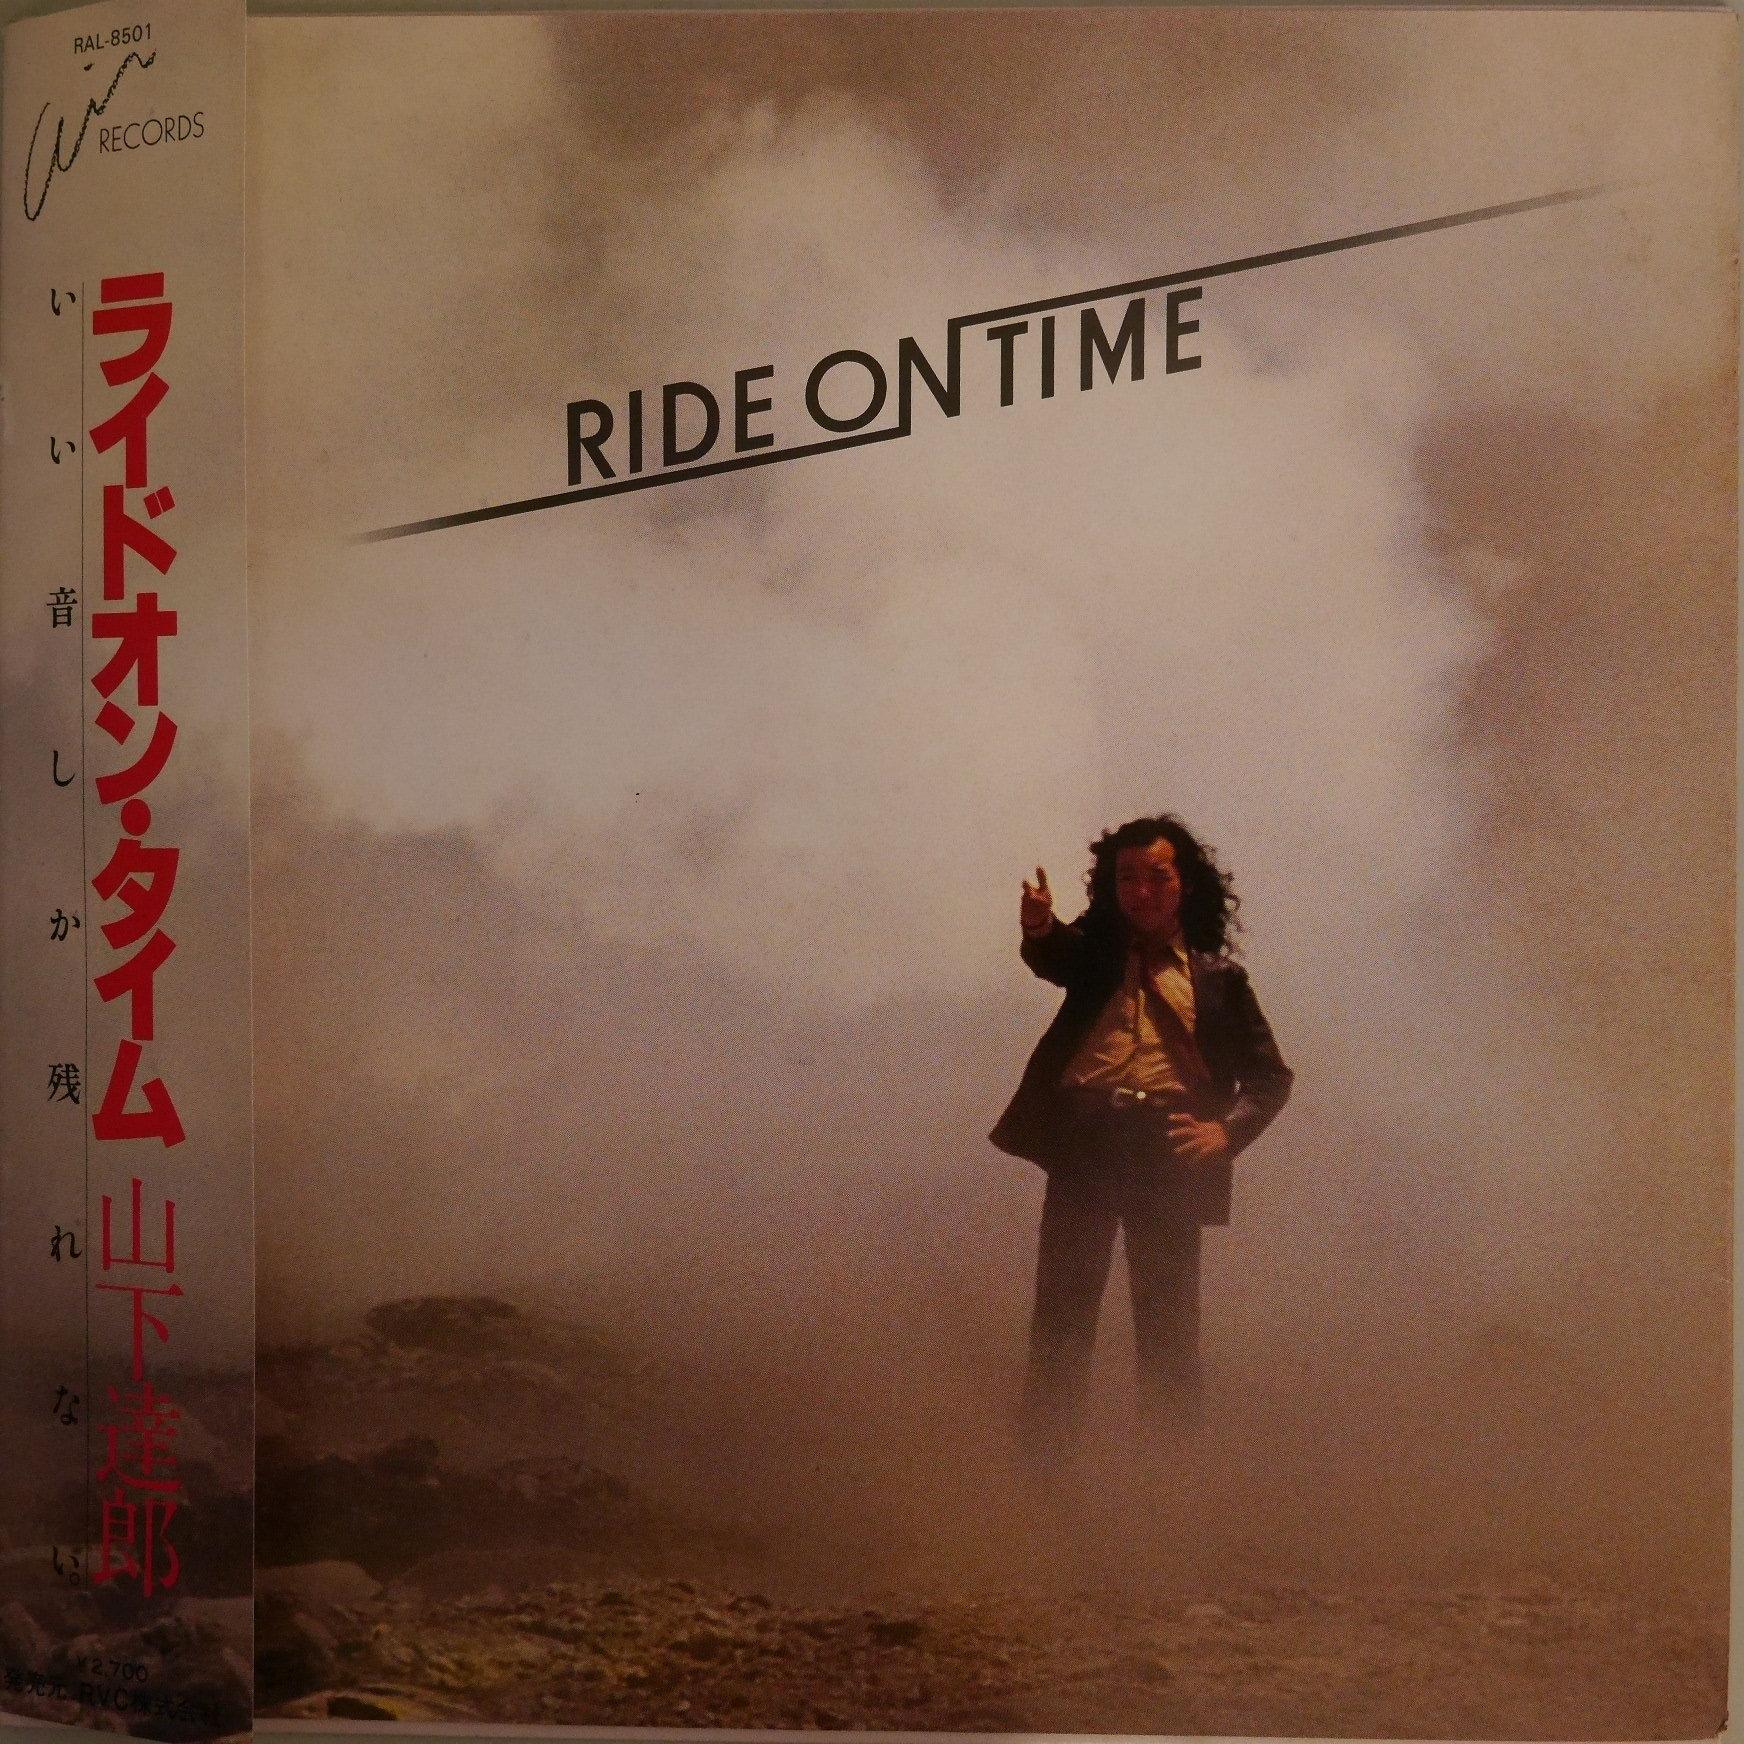 山下 達郎 on time ride